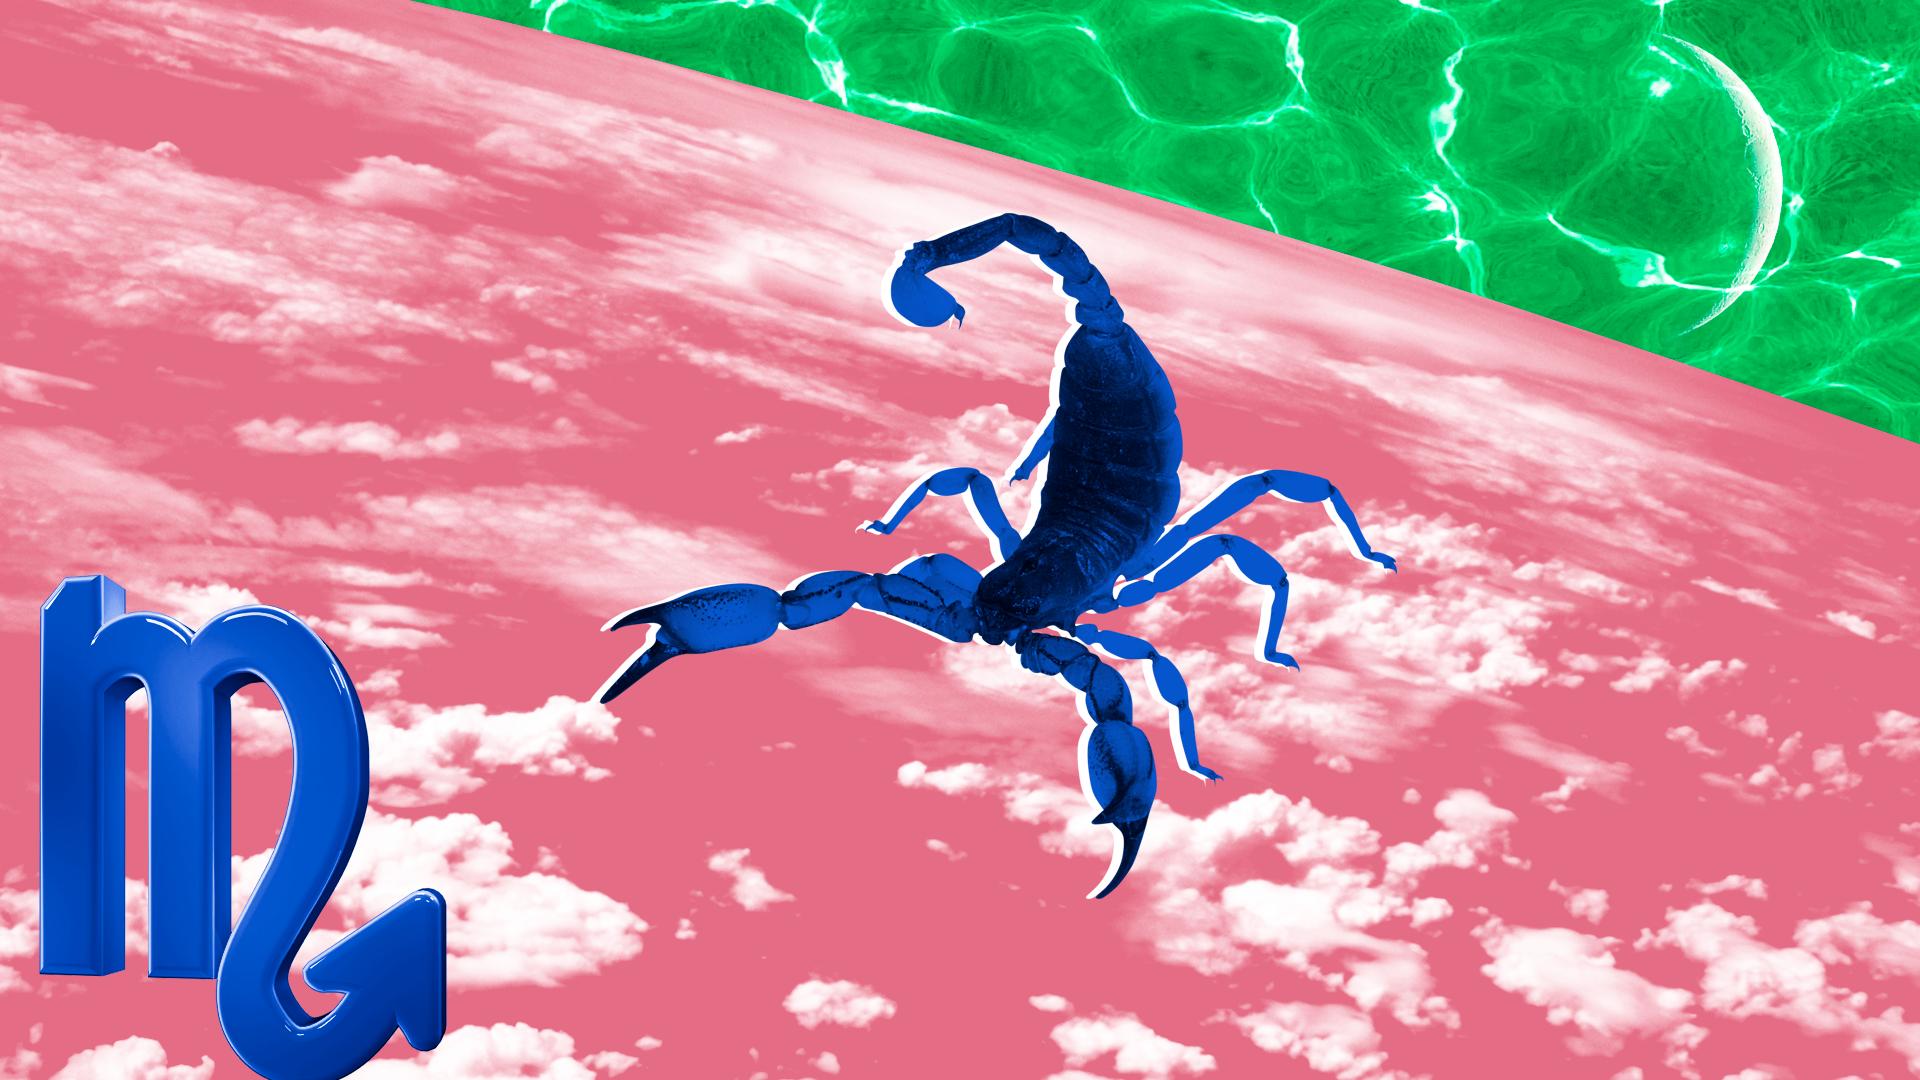 sheknows weekly horoscope